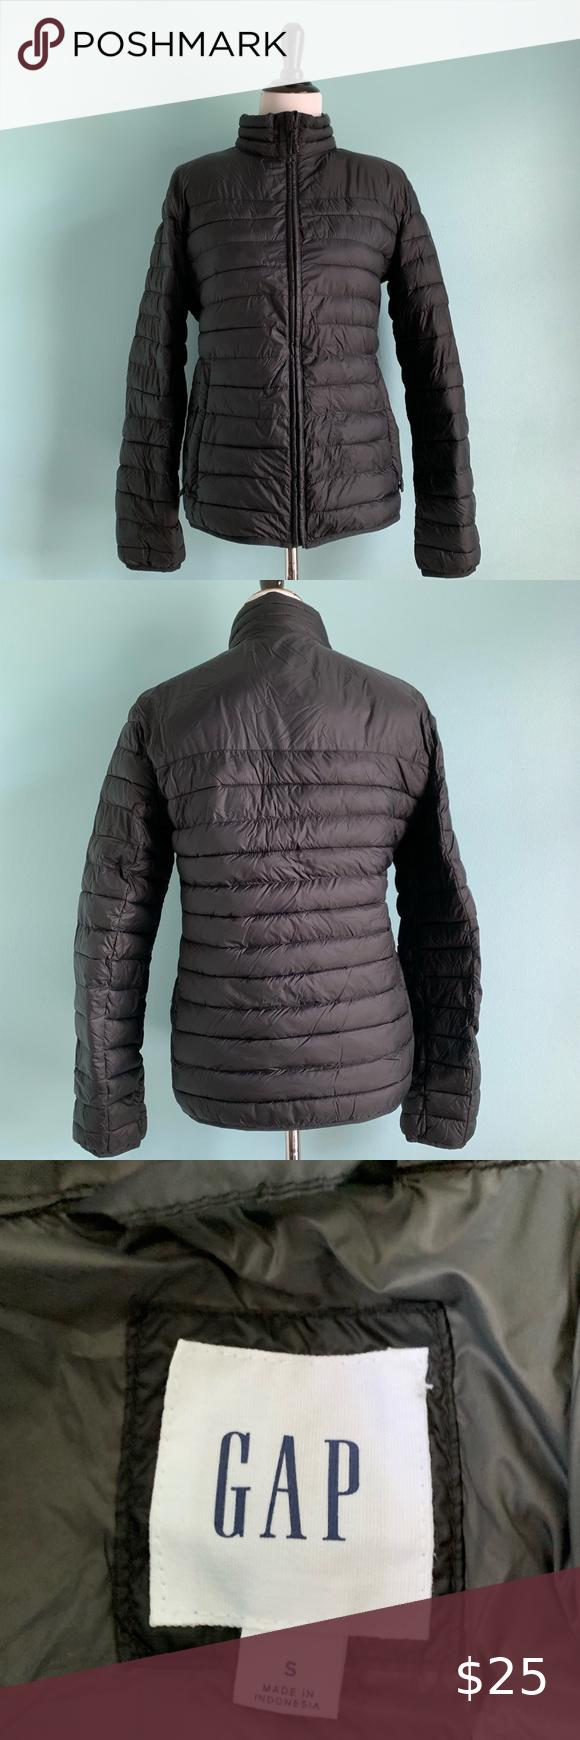 Men S Gap Black Puffer Jacket Small Black Puffer Jacket Black Puffer Jackets [ 1740 x 580 Pixel ]